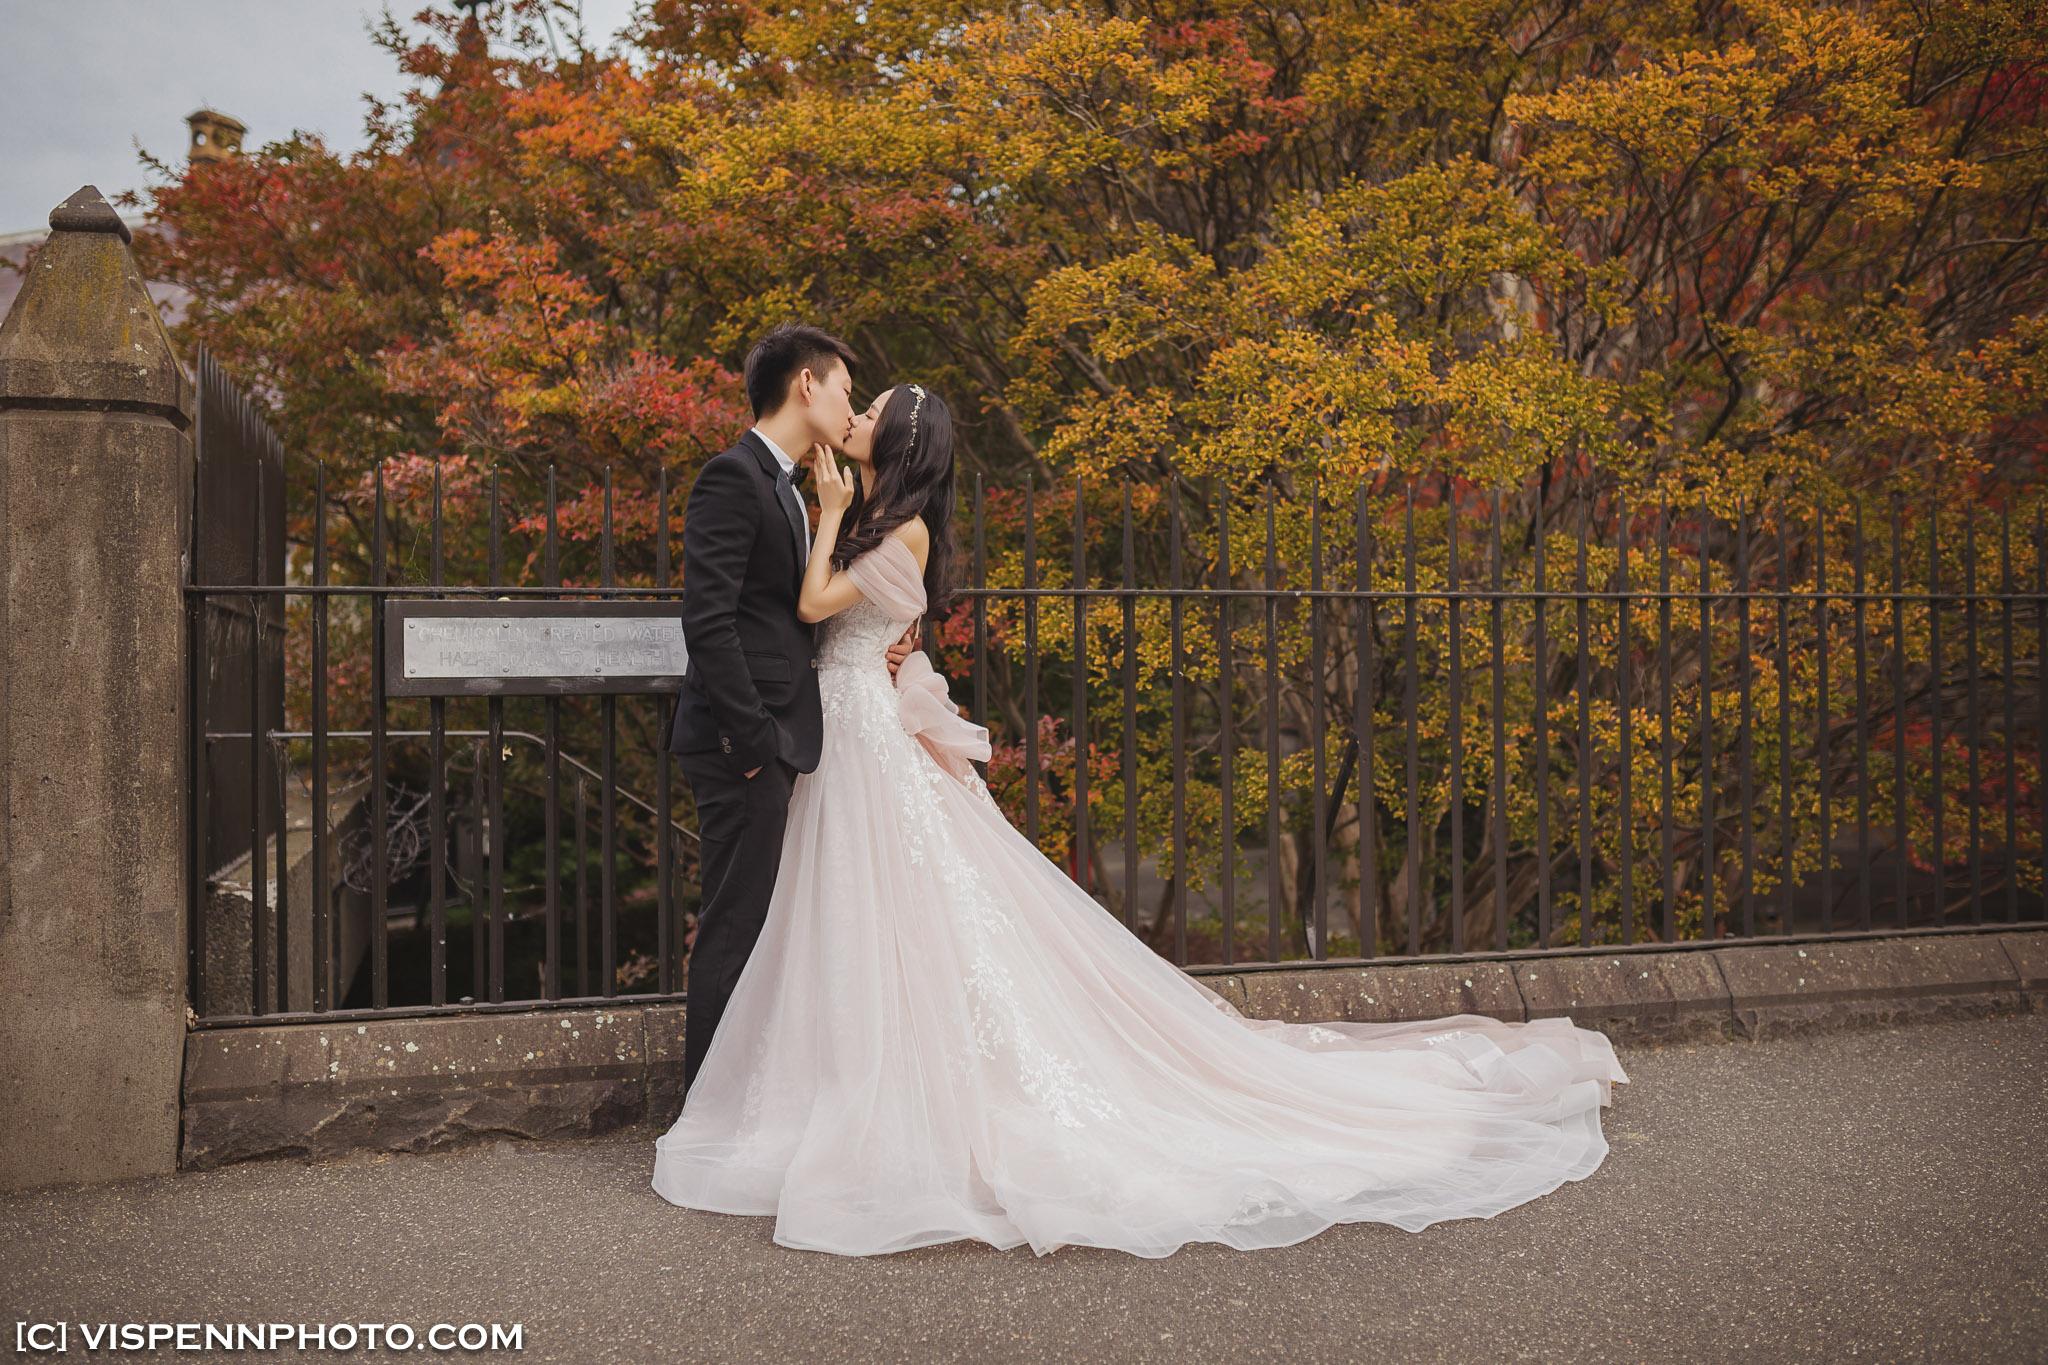 PRE WEDDING Photography Melbourne ZHPENN P5D4 1088